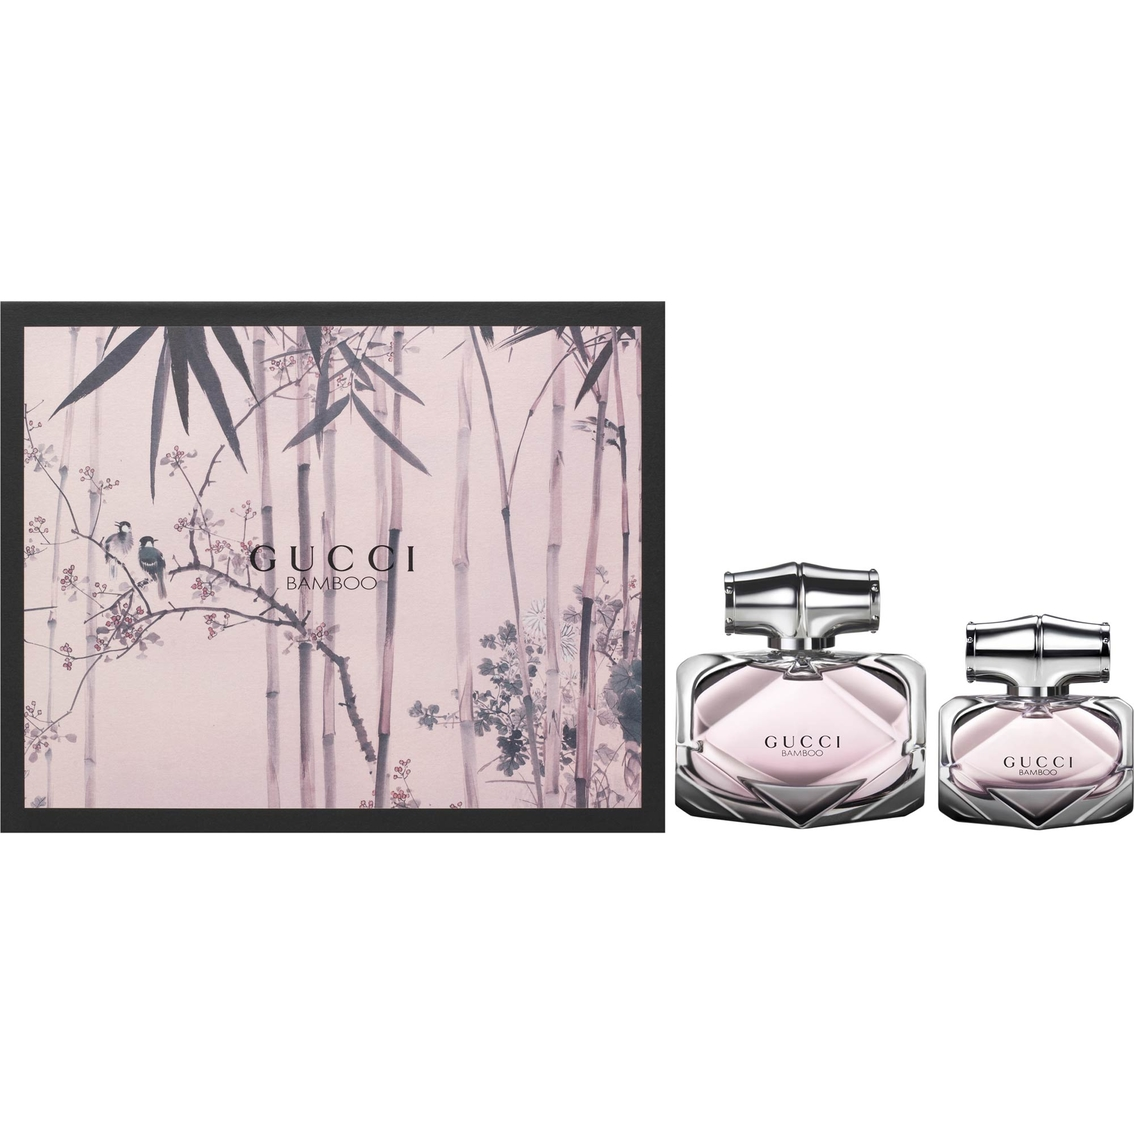 82d18276e Gucci Bamboo Eau De Parfum 2 Pc. Set | Fragrance Gift Sets | Beauty ...